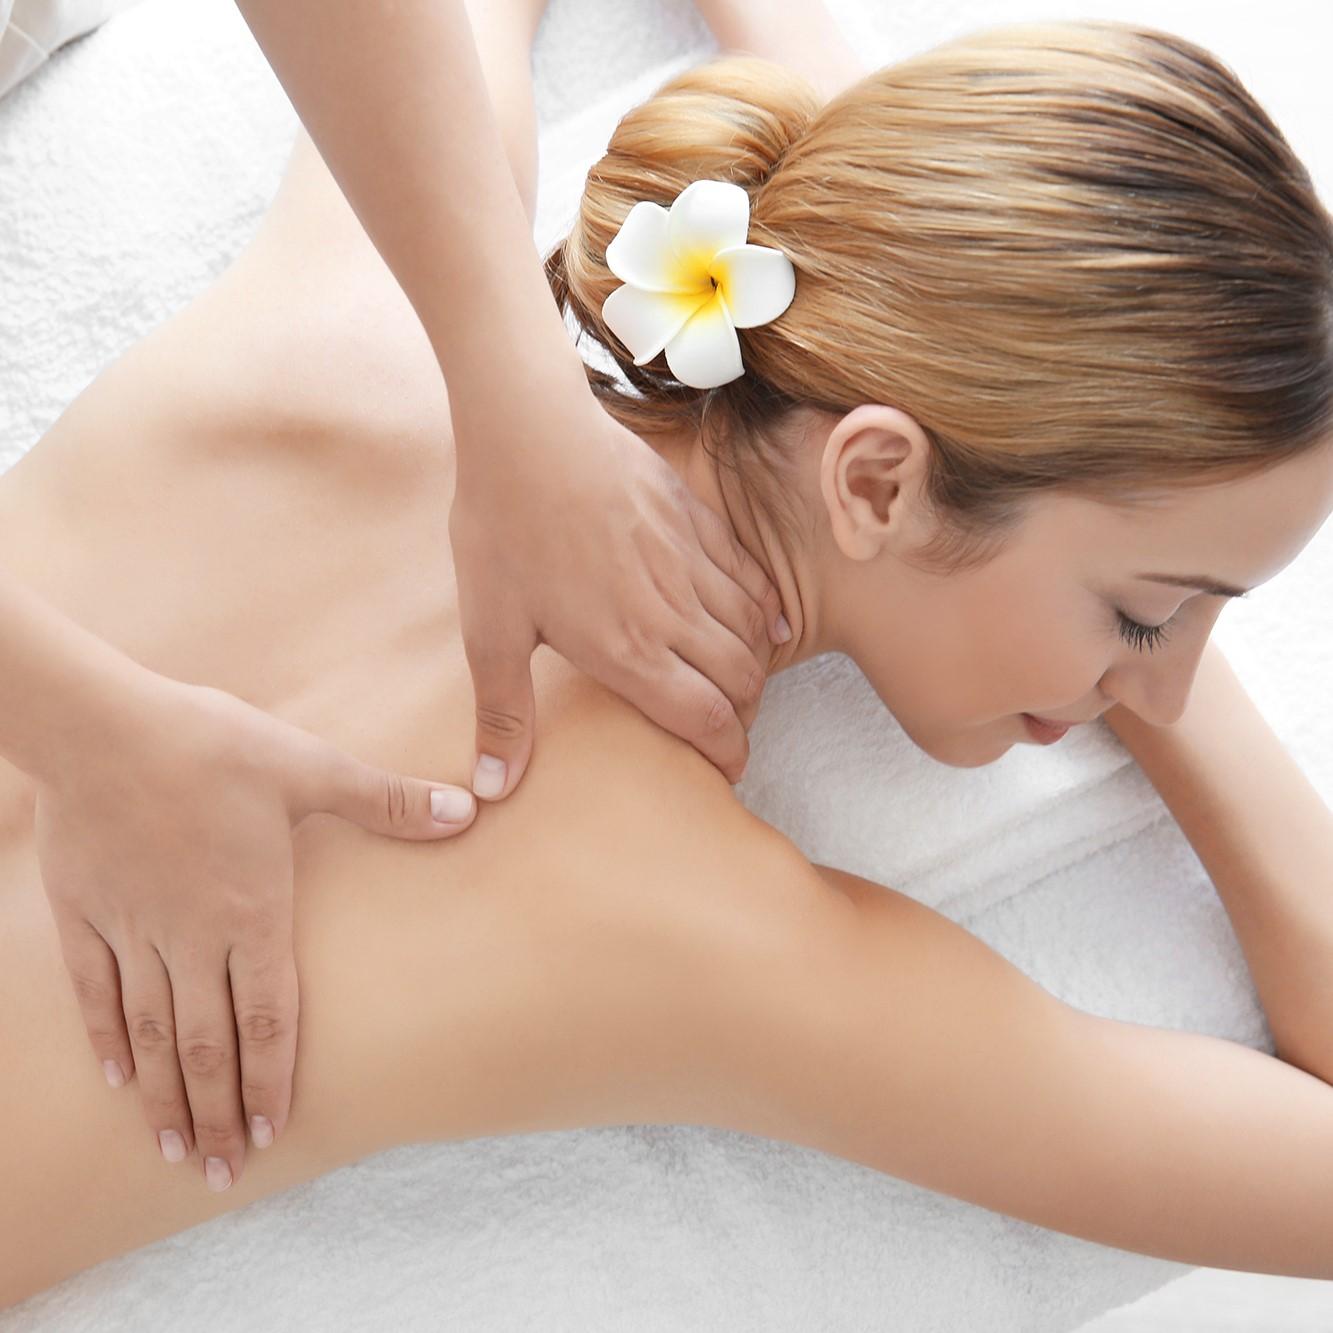 60-Min Full Body Massage for 1 Person (1 Session)